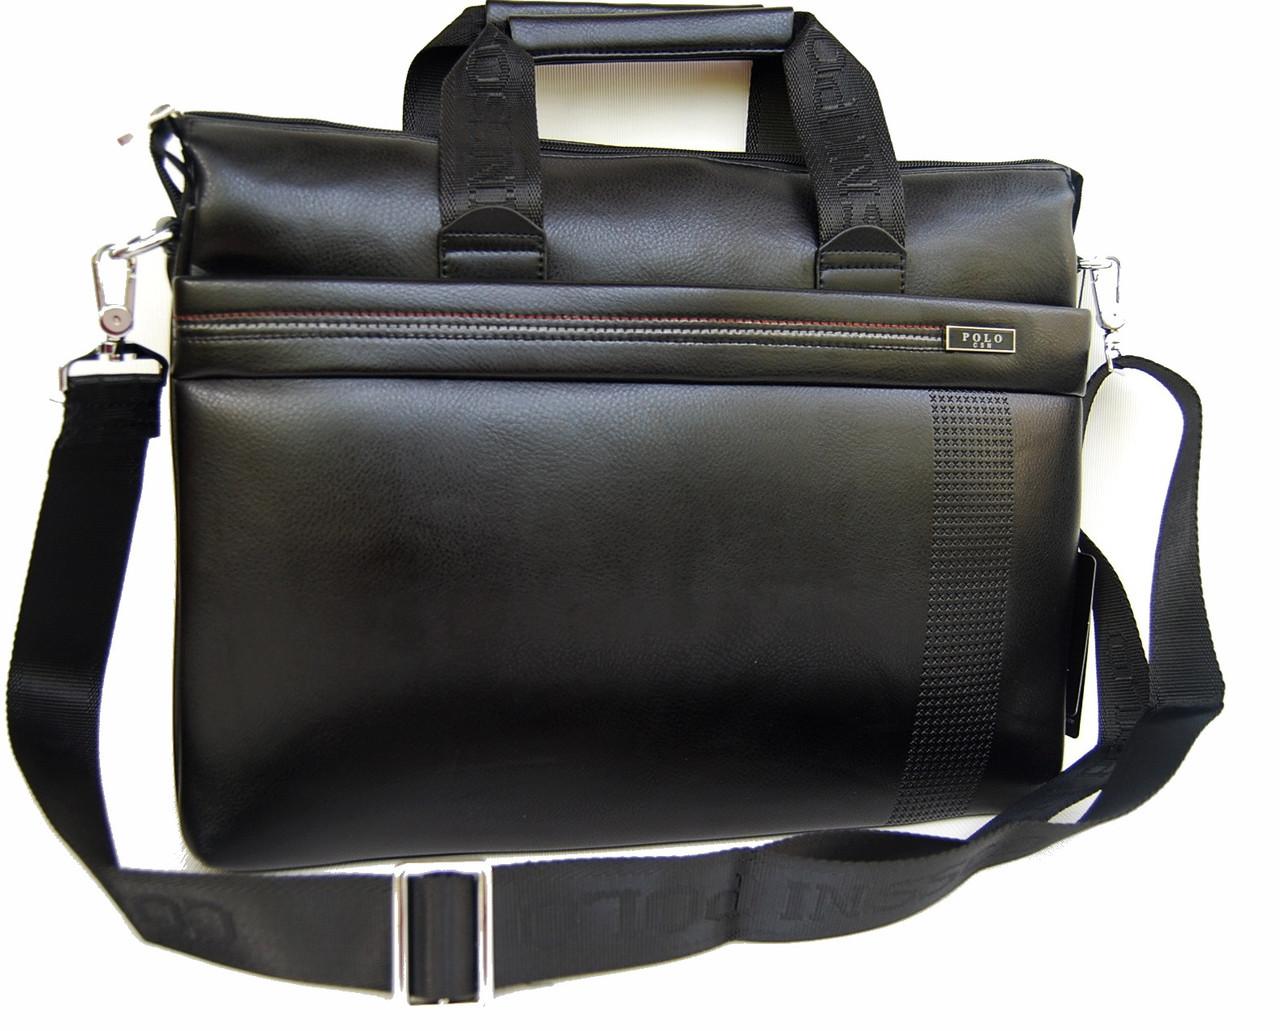 8ed59687211e Мужская сумка-портфель Polo под формат А4 КС62 - интернет-магазин